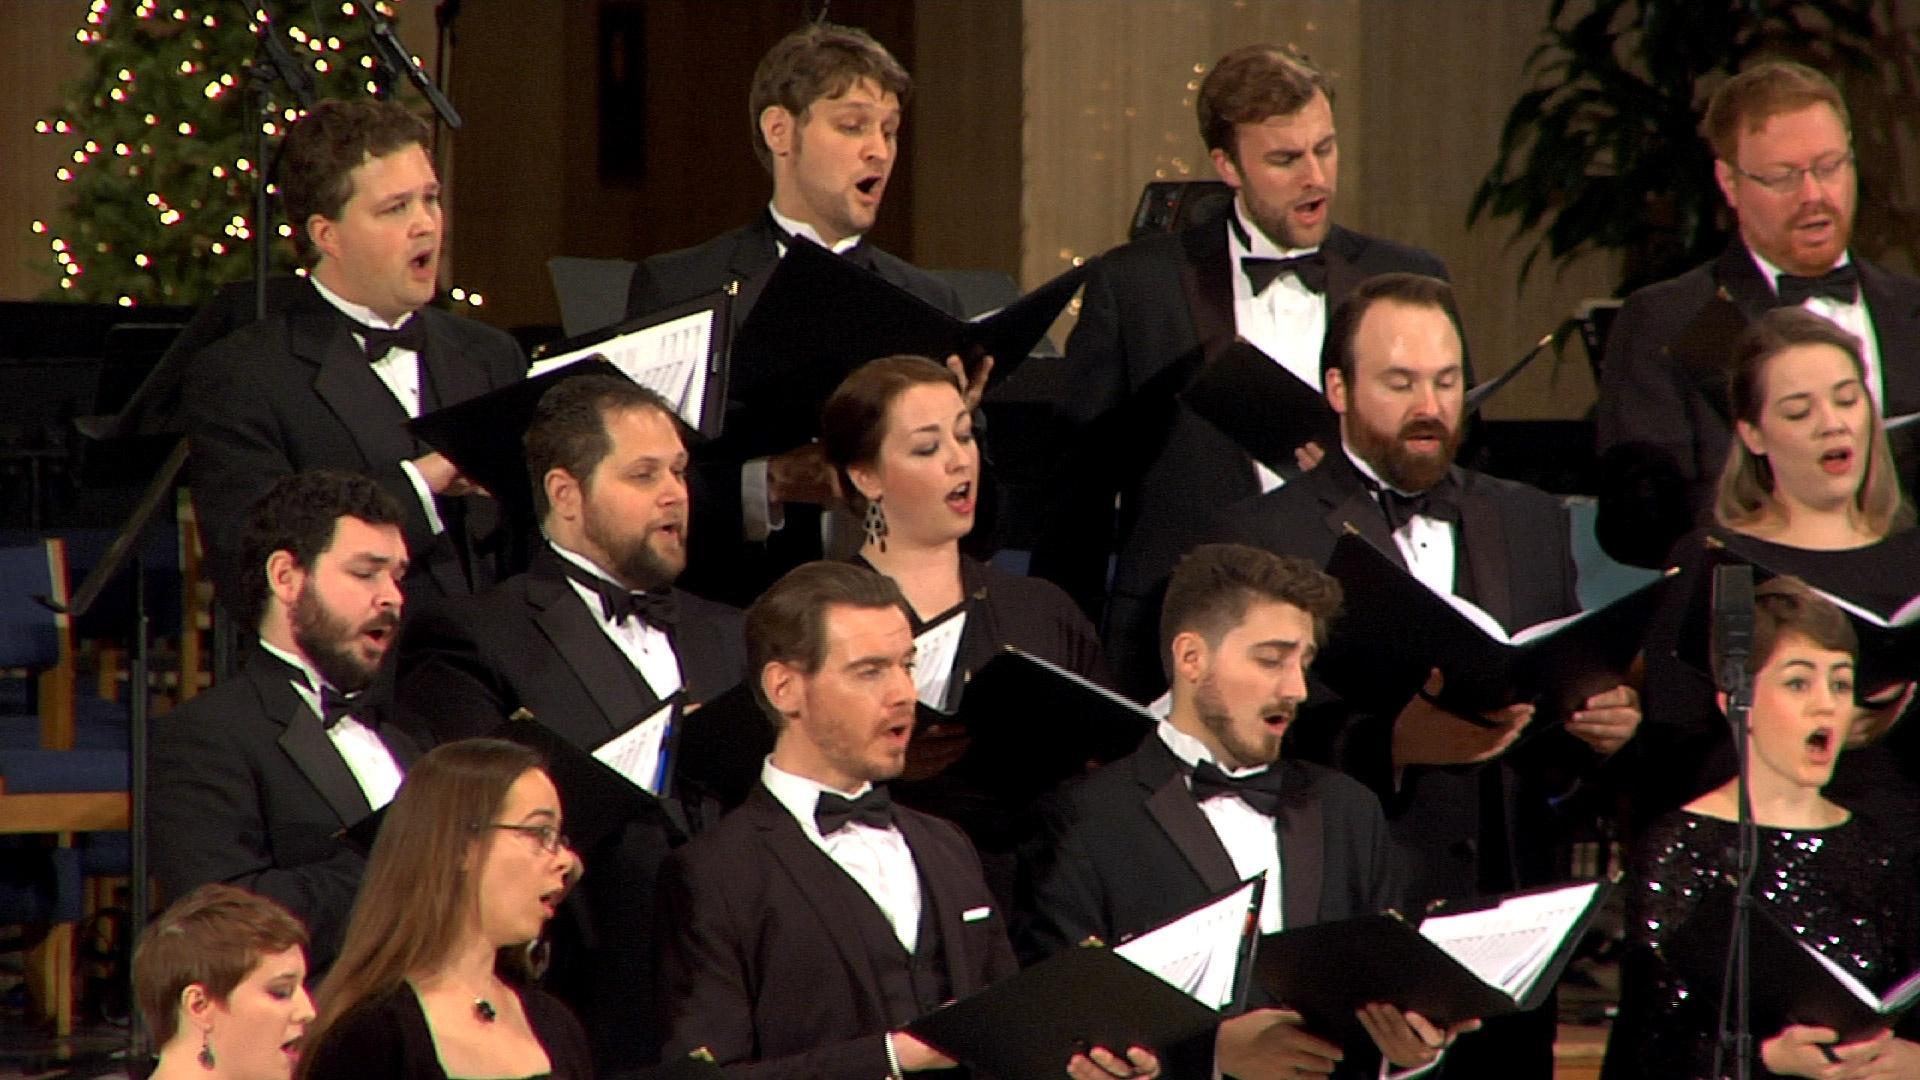 Religion & Ethics NewsWeekly - Christmas Music Tells the Story ...